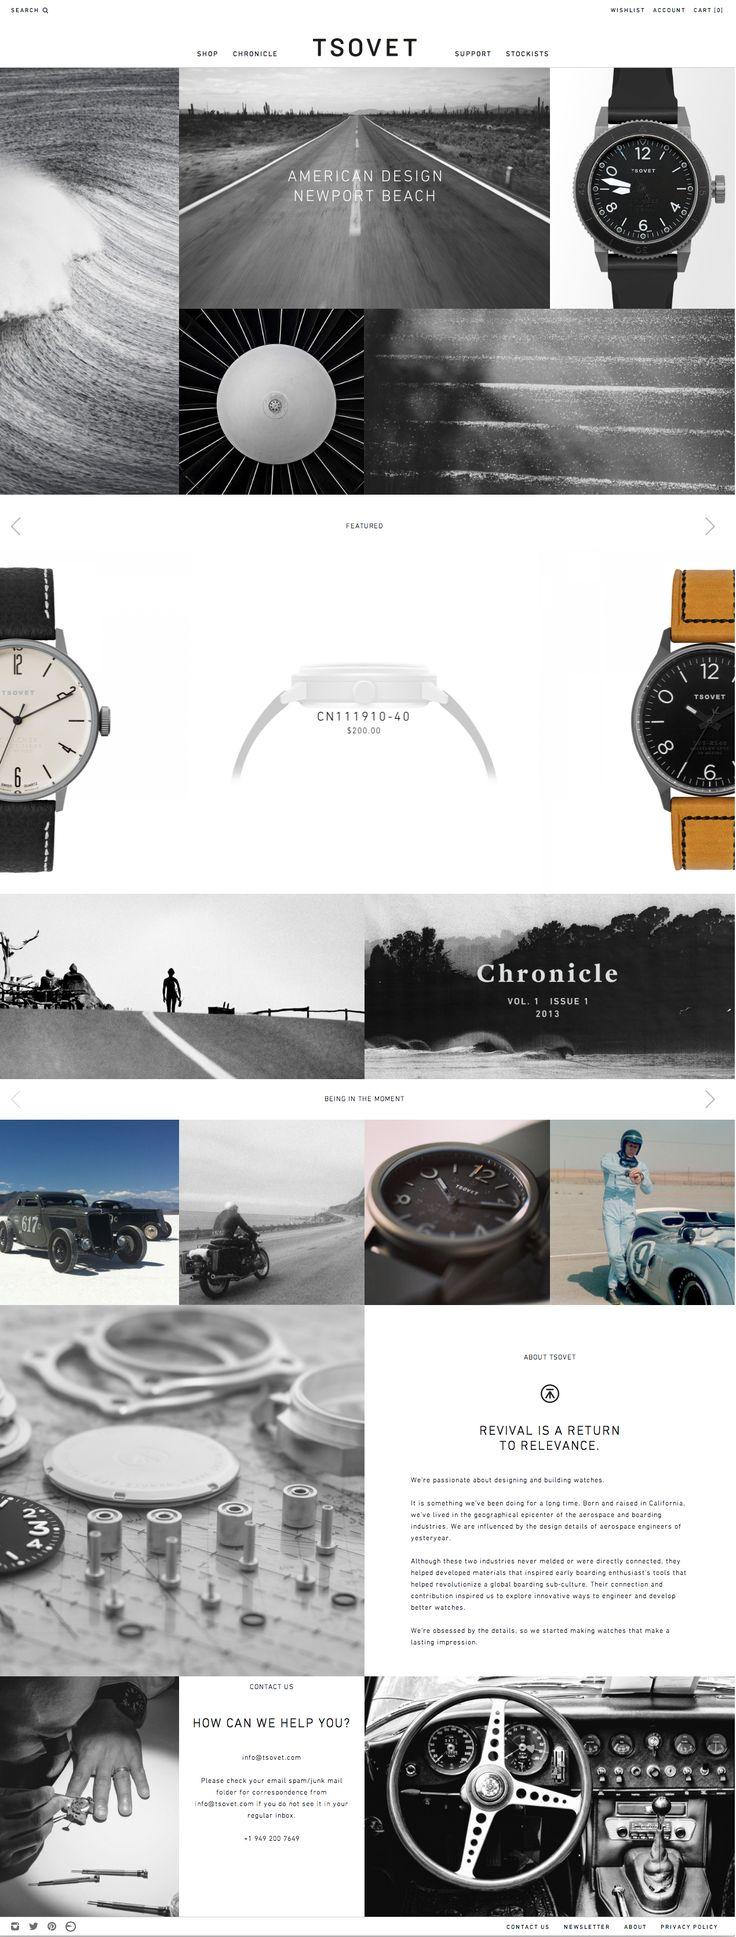 http://www.tsovet.com   #webdesign #it #web #design #layout #userinterface #website #webdesign < repinned by www.BlickeDeeler.de   Visit our website www.blickedeeler.de/leistungen/webdesign